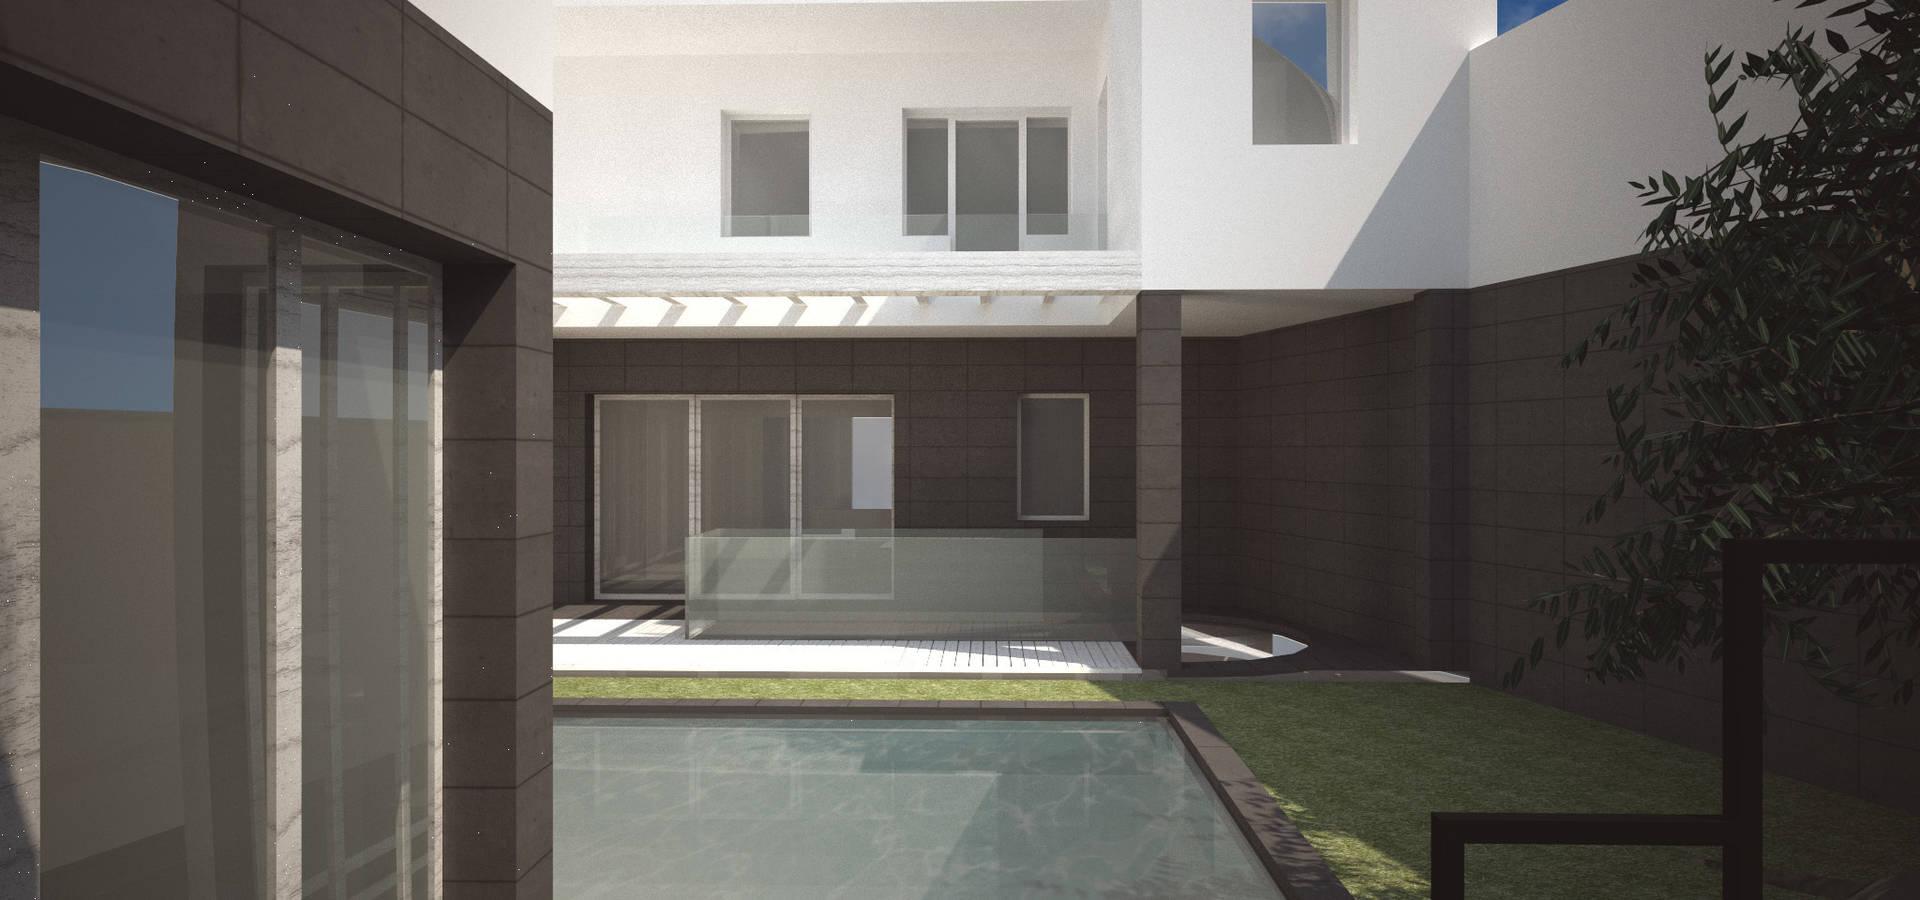 pars architetti _ Paola Addis & Roberto Senes